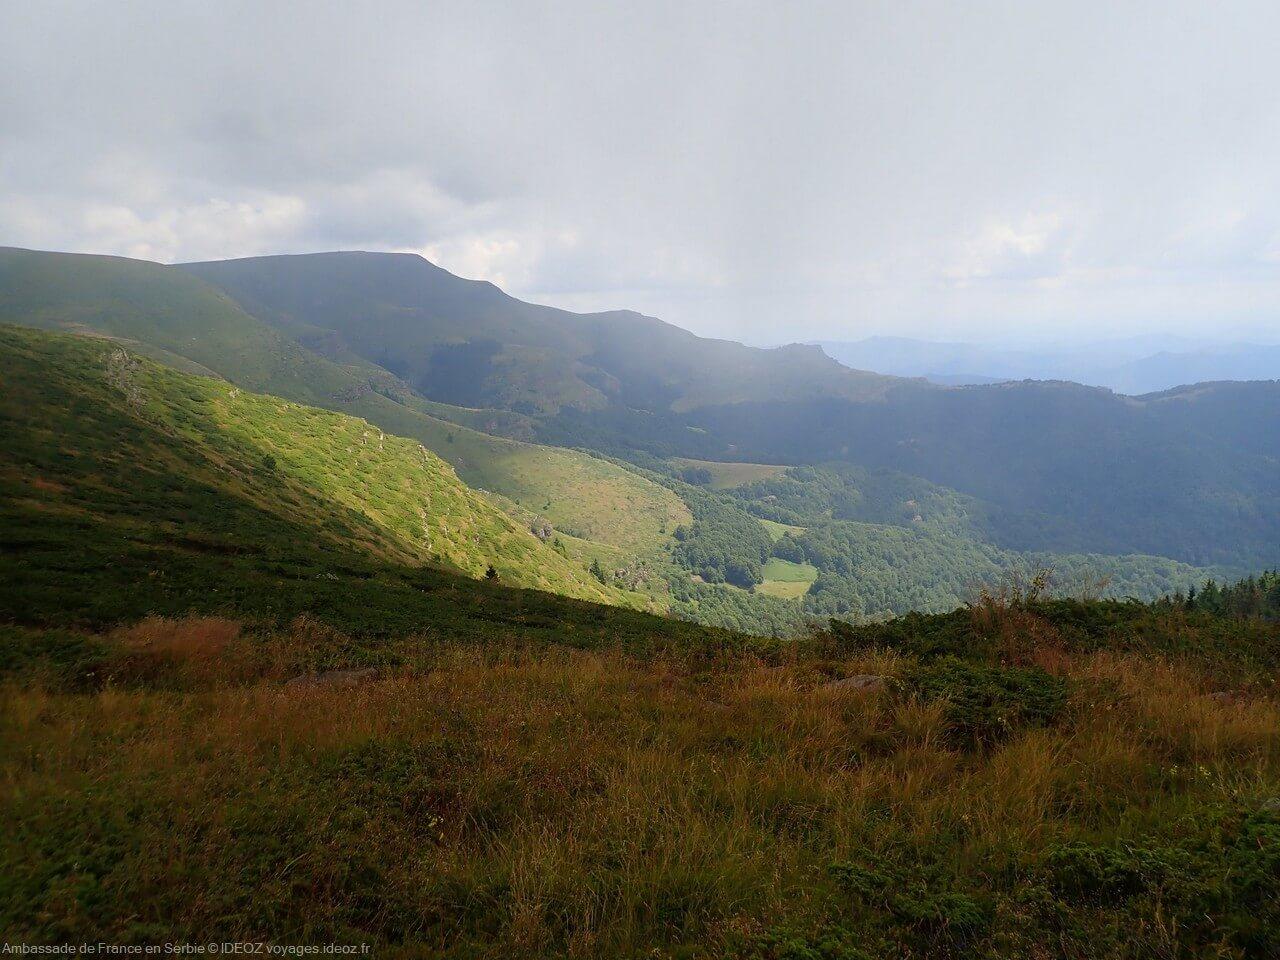 Randonnée à Stara Planina, sur la via dinarica voie verte en Serbie 10